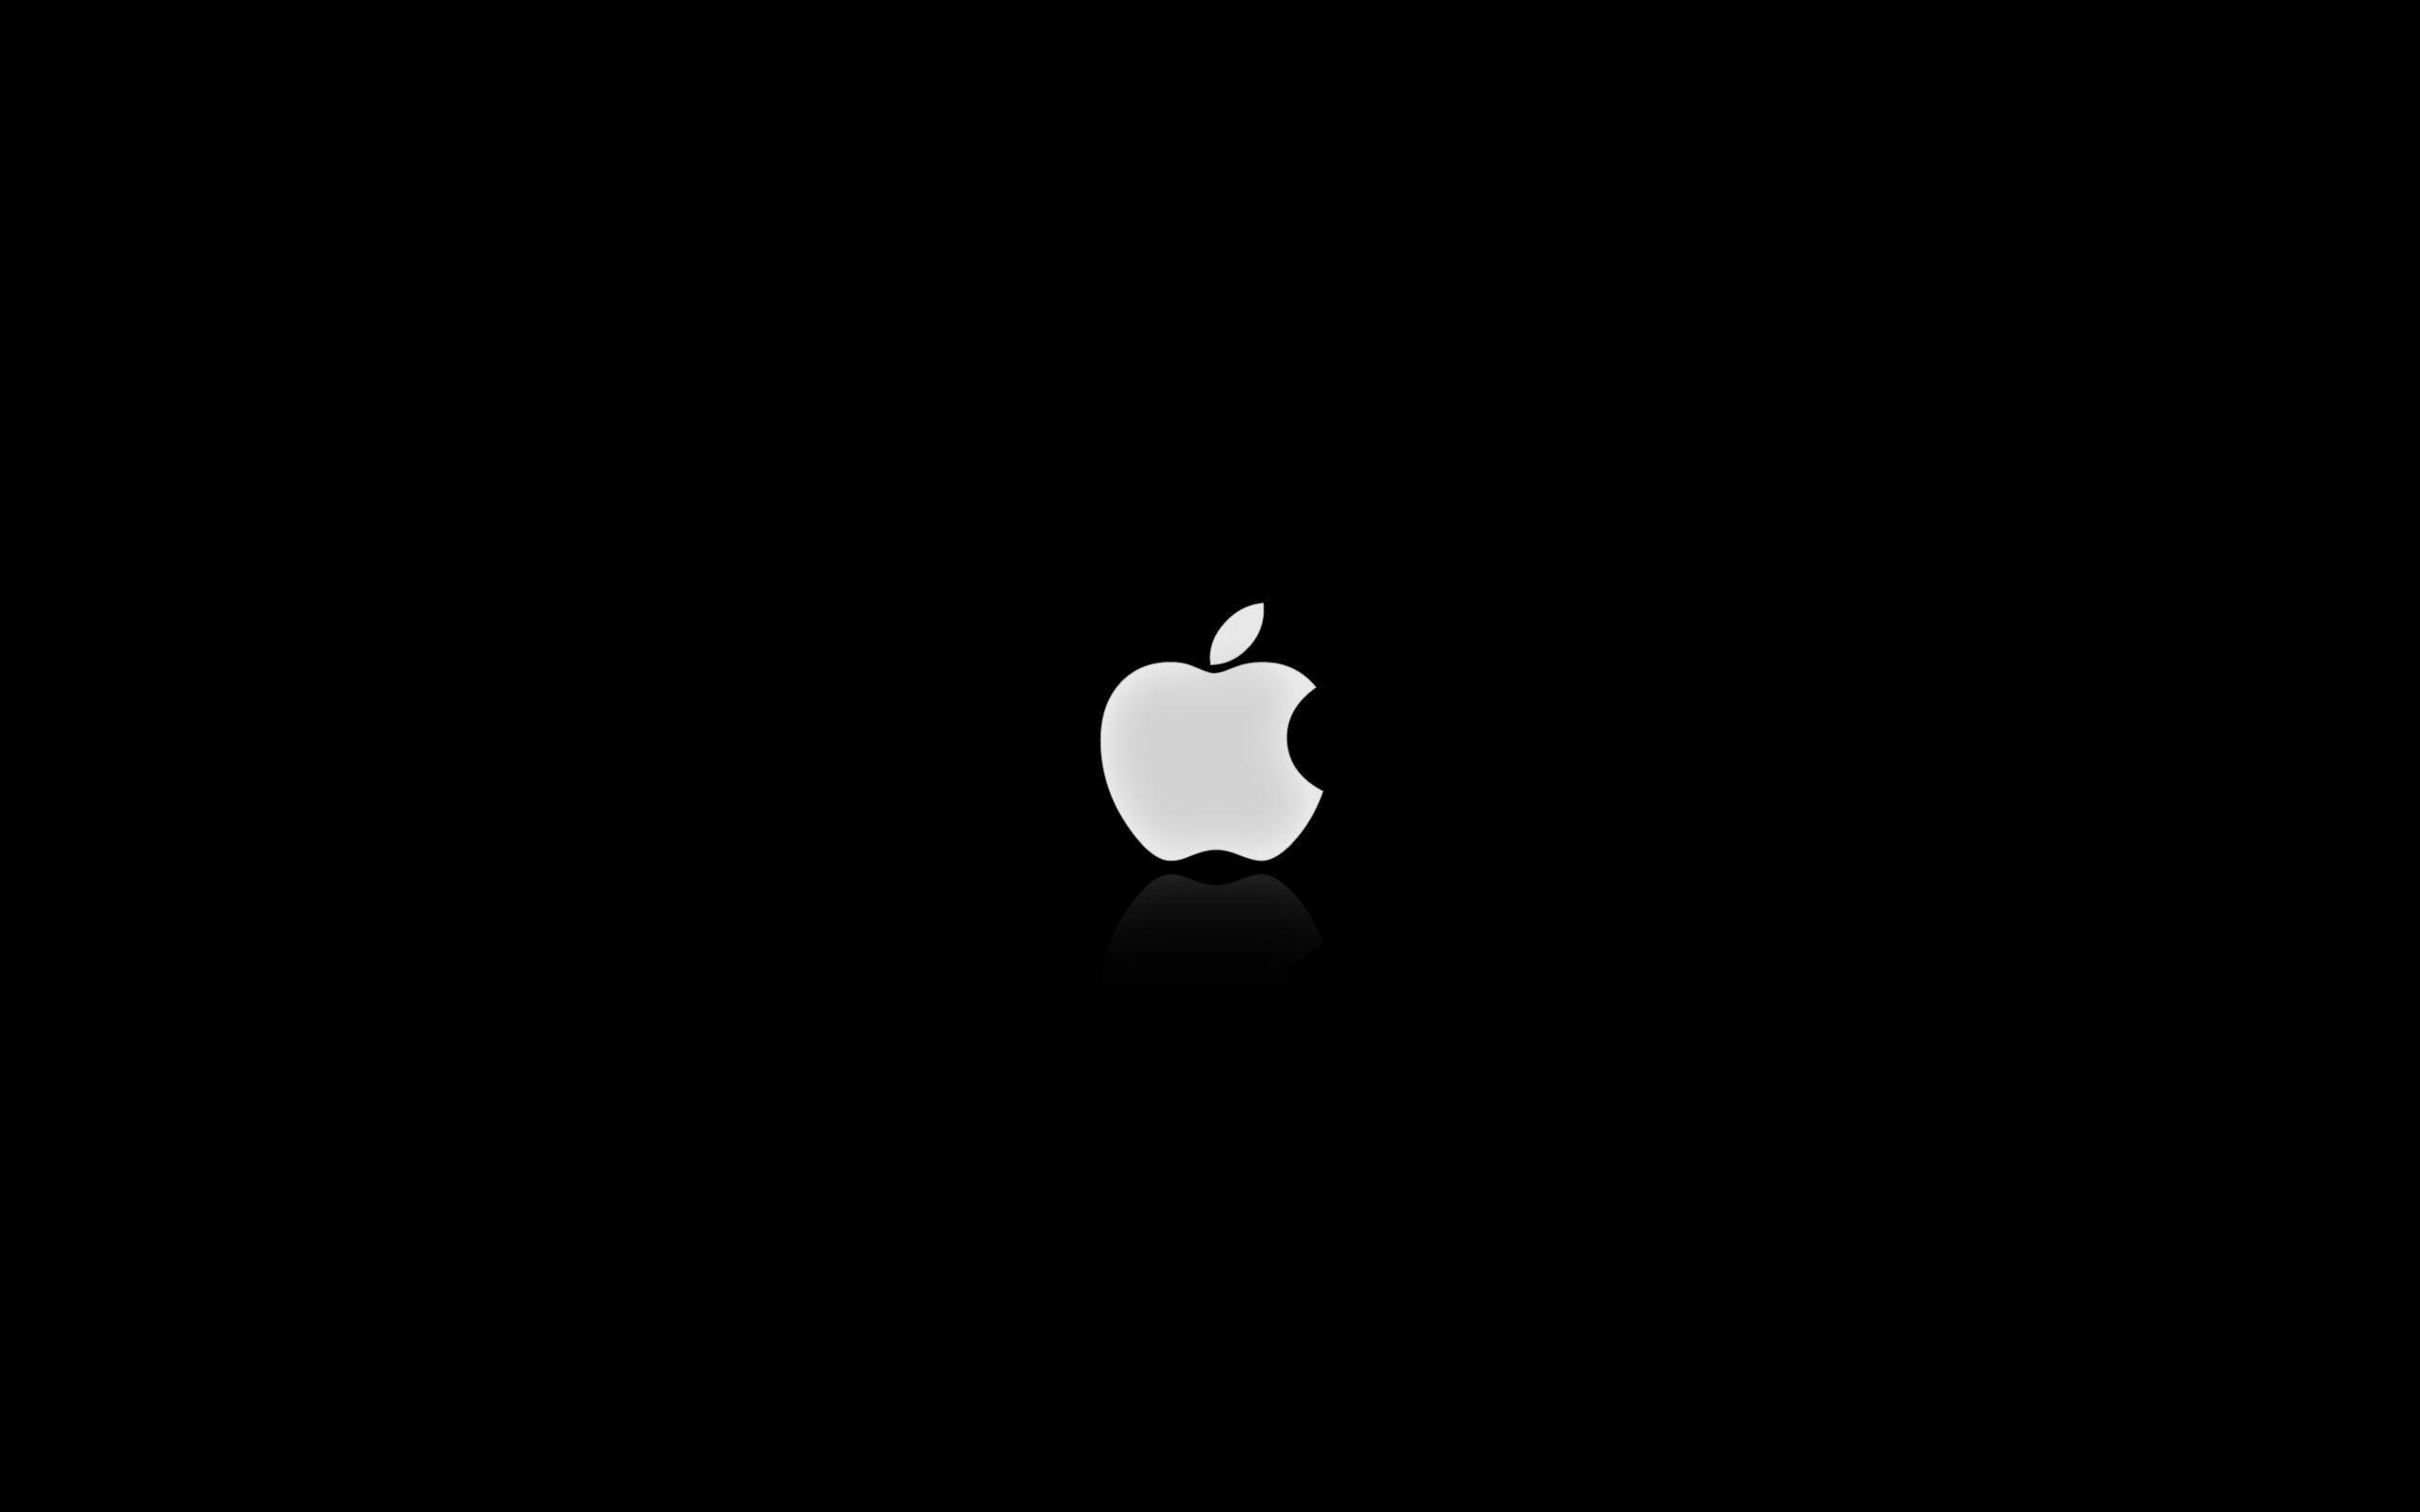 black screen wallpaper for laptop